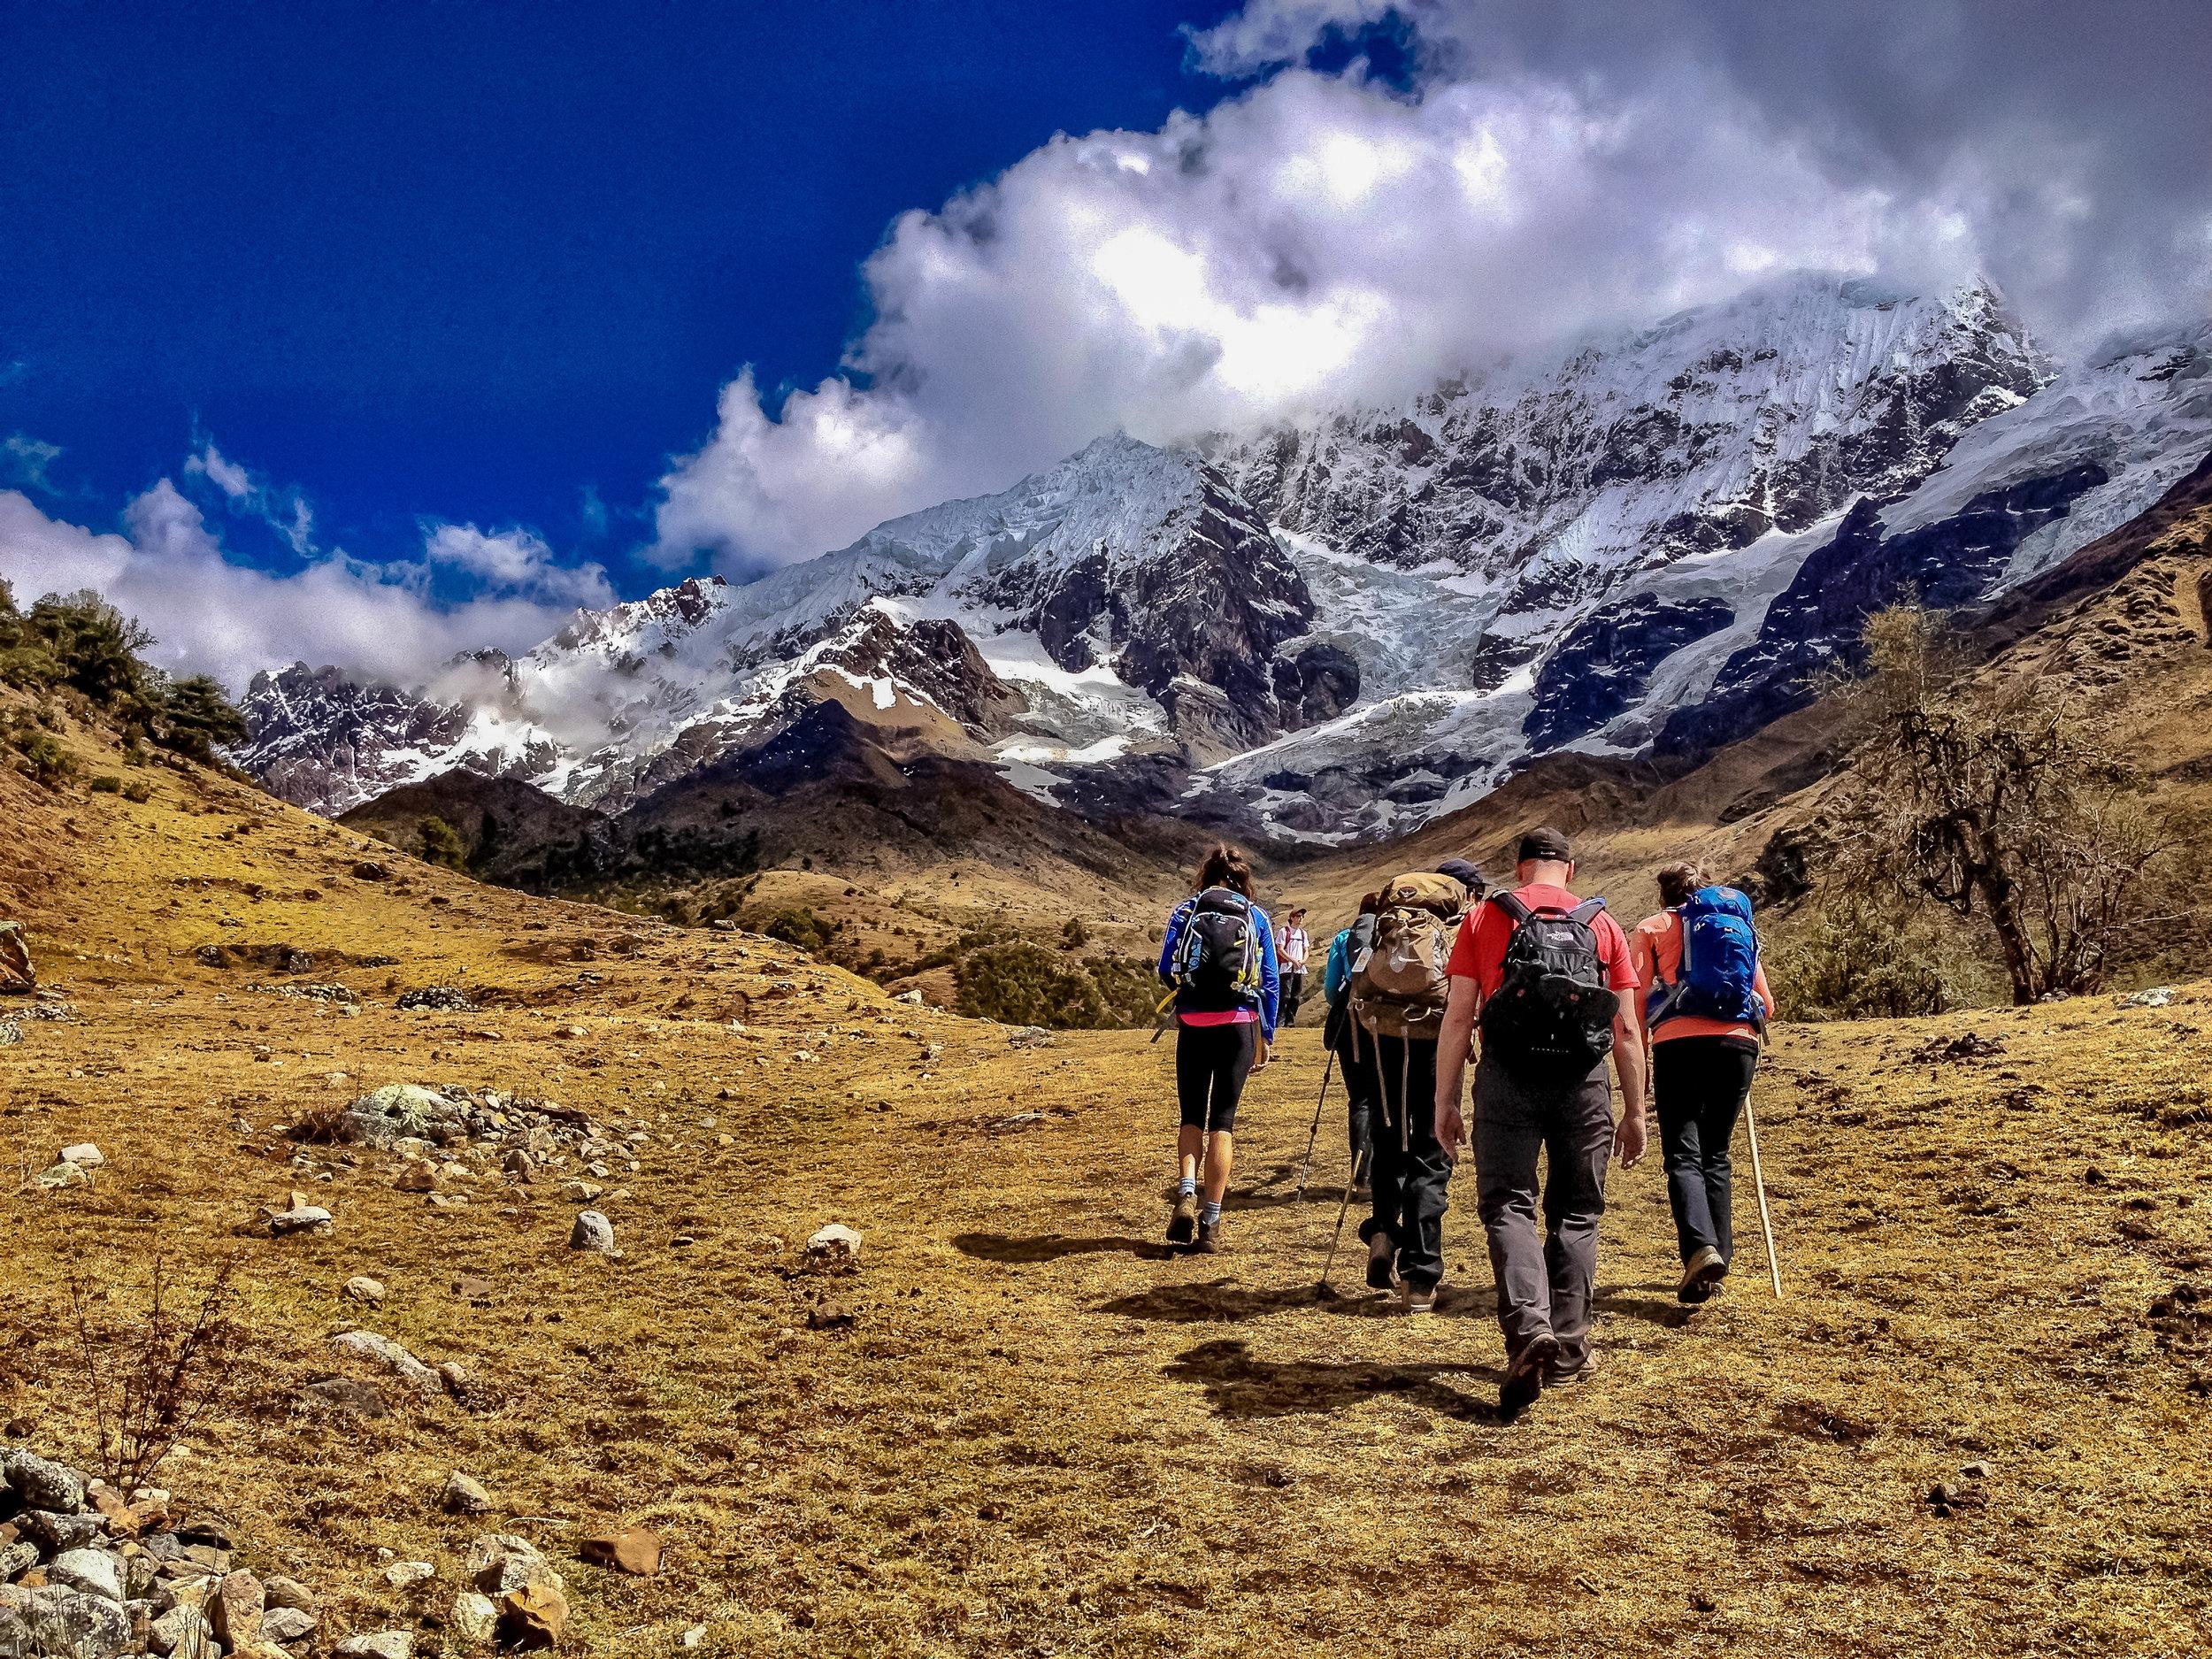 Journey to Machu Picchu